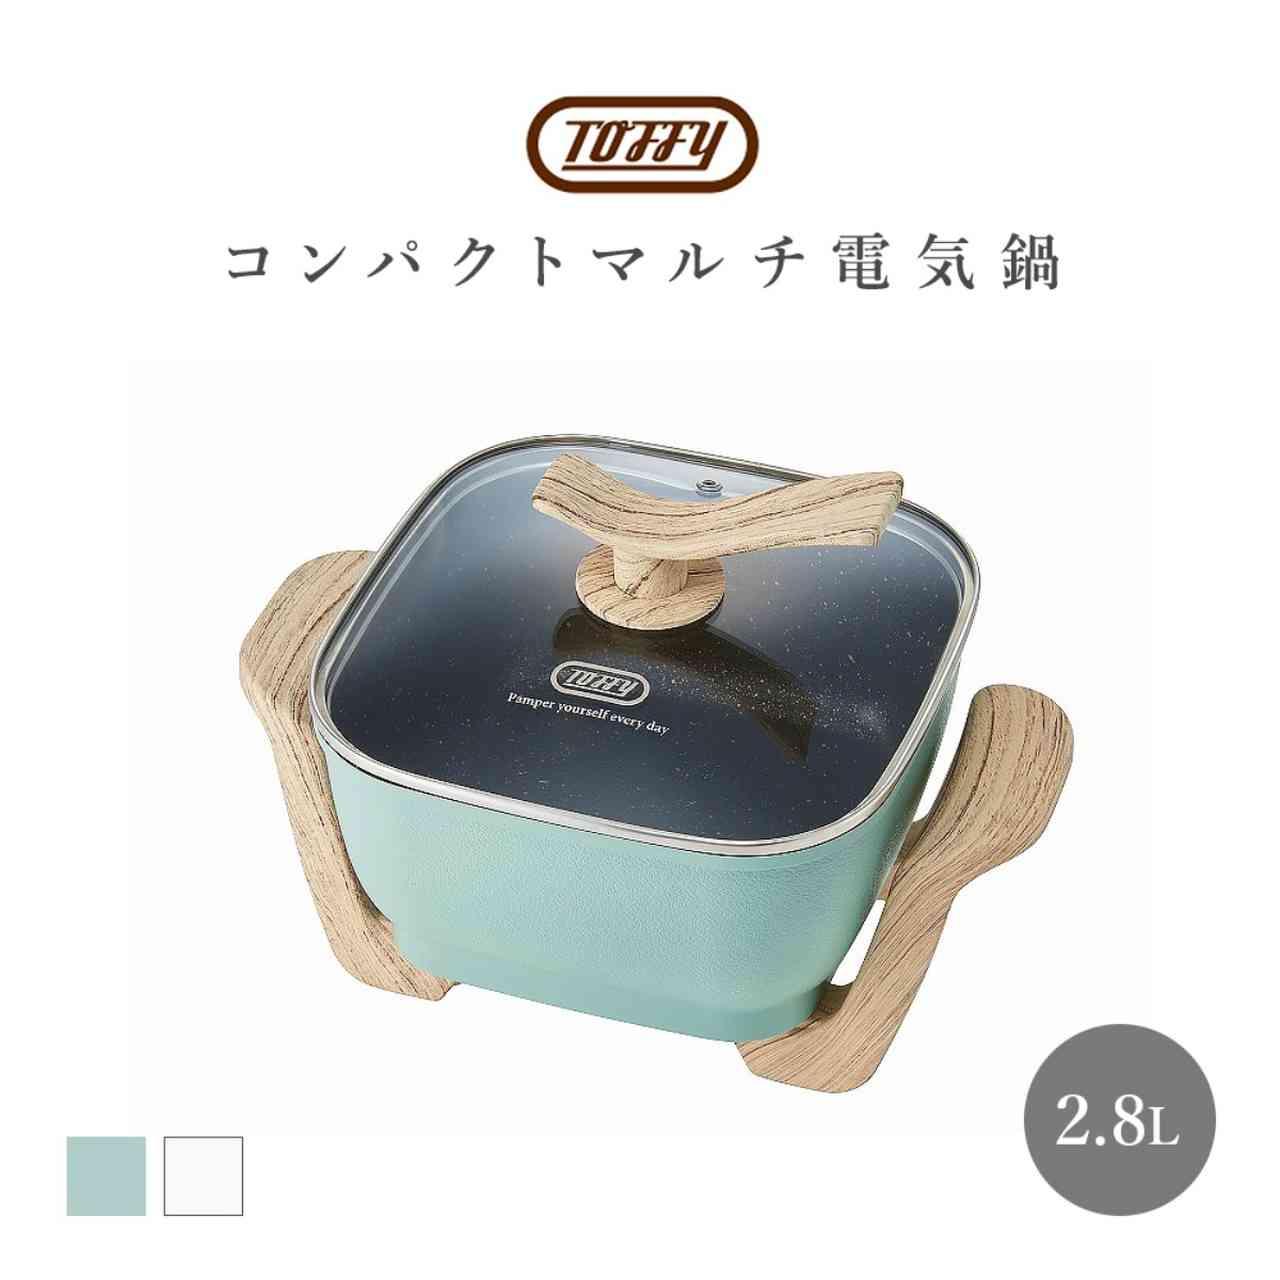 Toffy(トフィ) コンパクトマルチ電気鍋